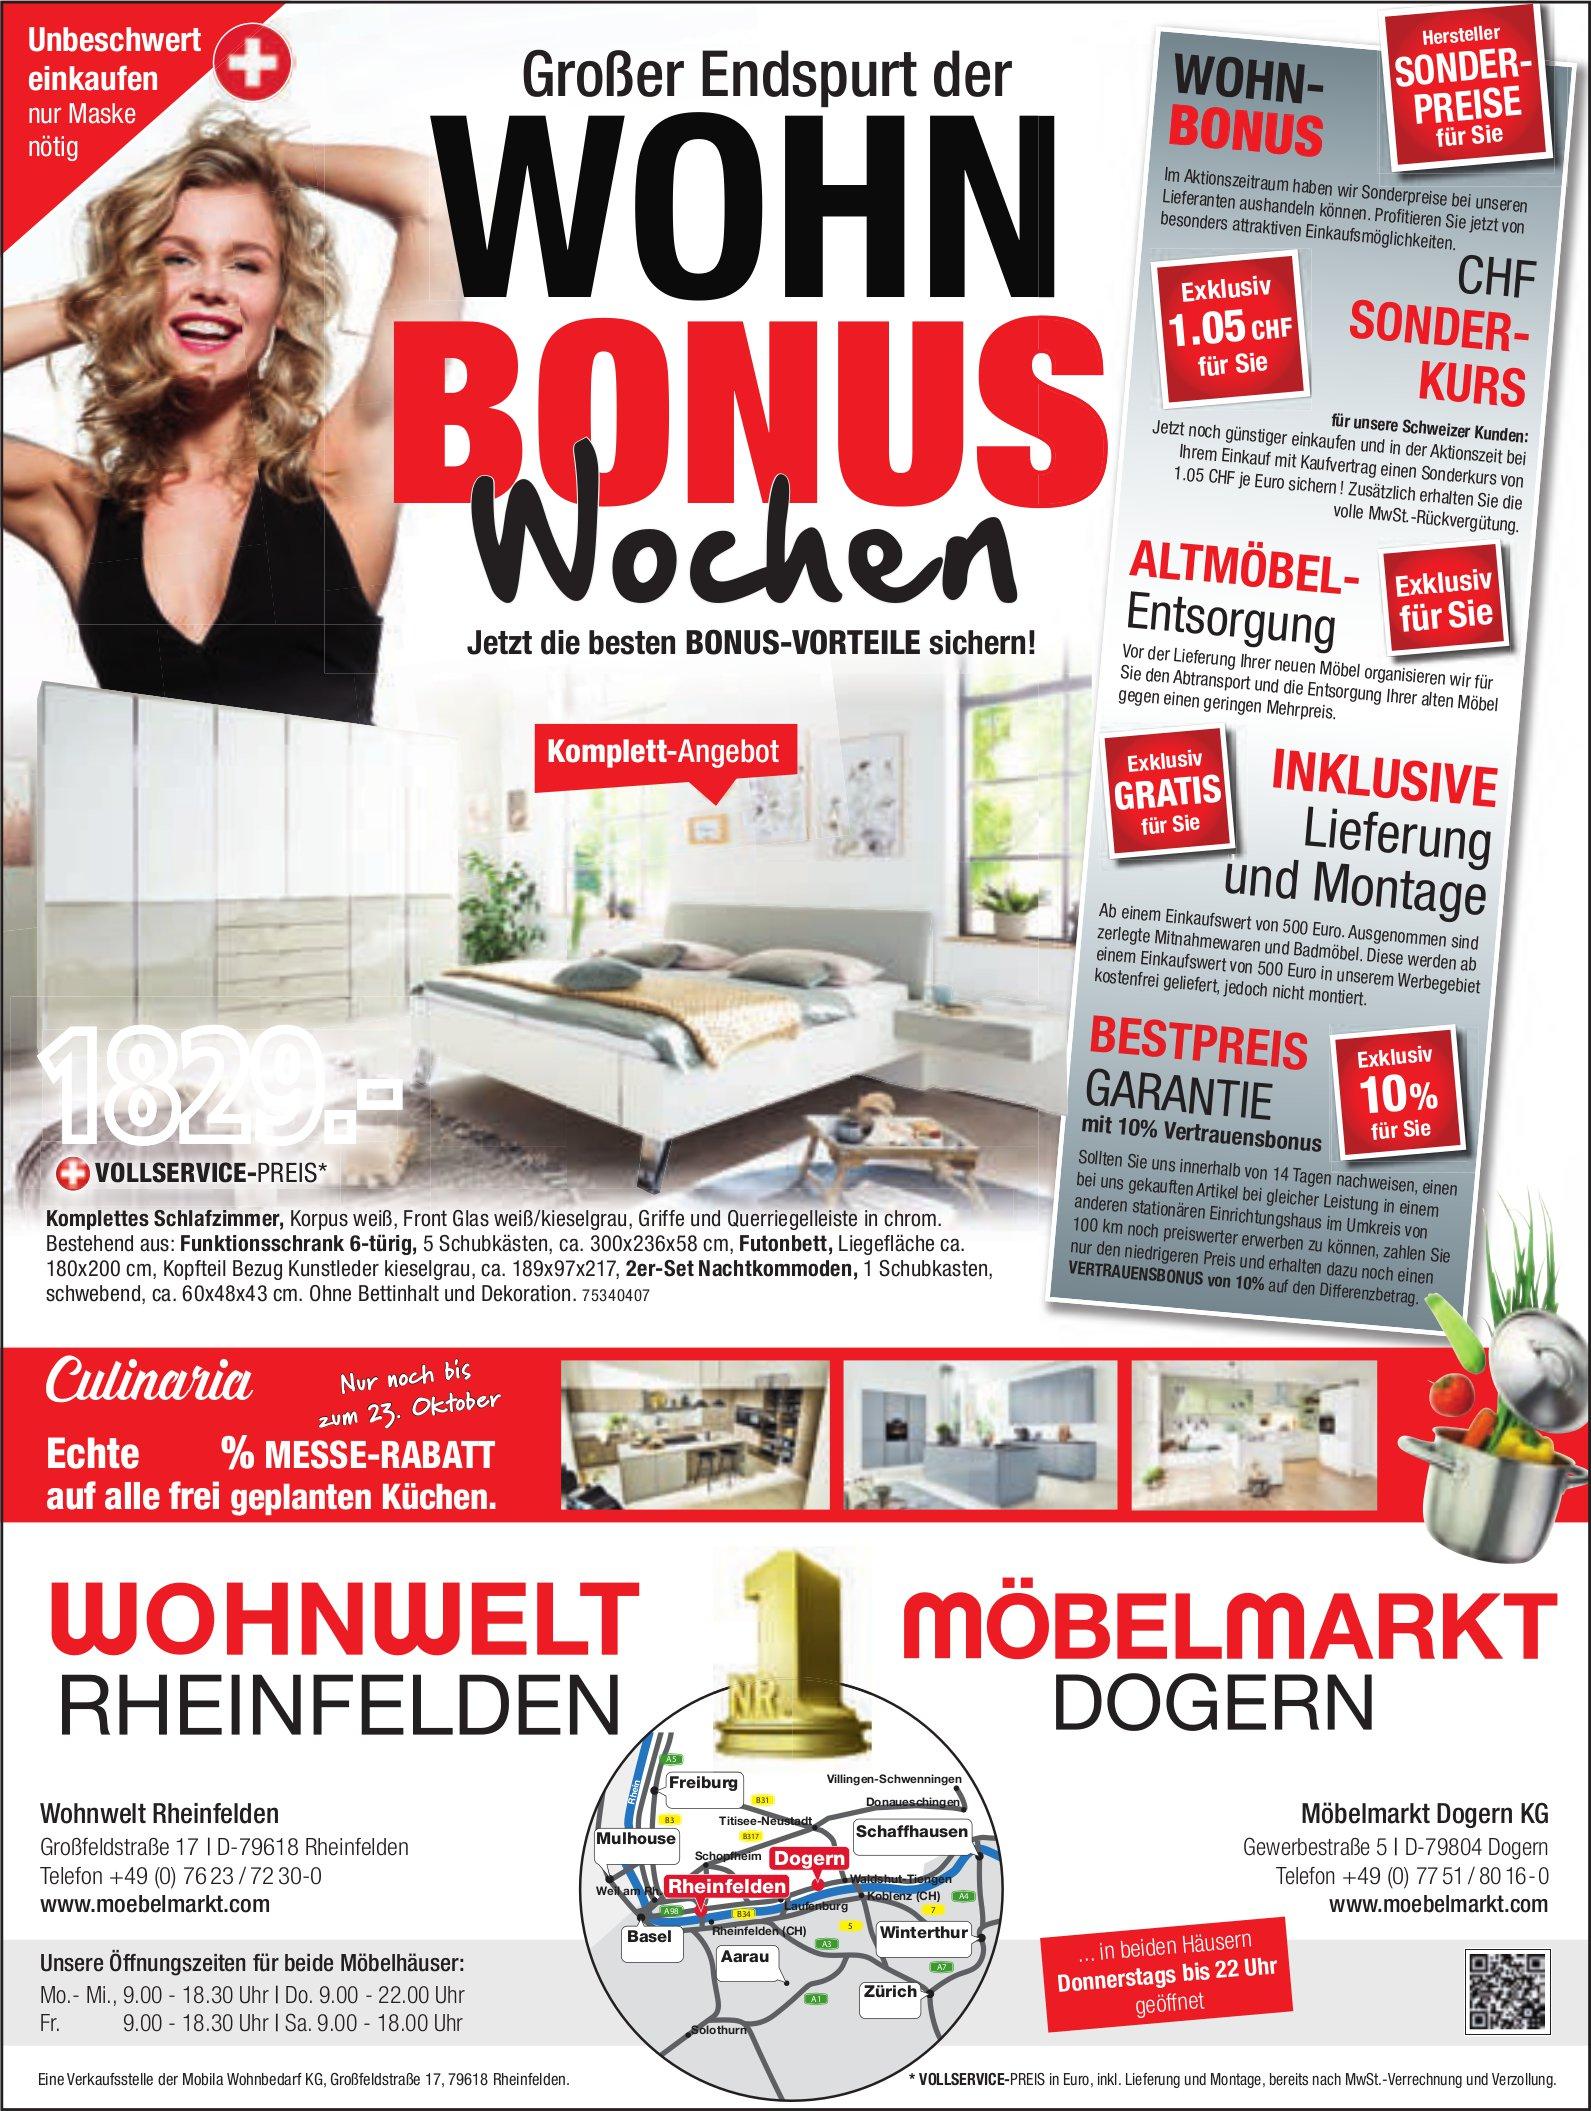 Wohnwelt, D-Rheinfelden - Wohn Bonus Wochen